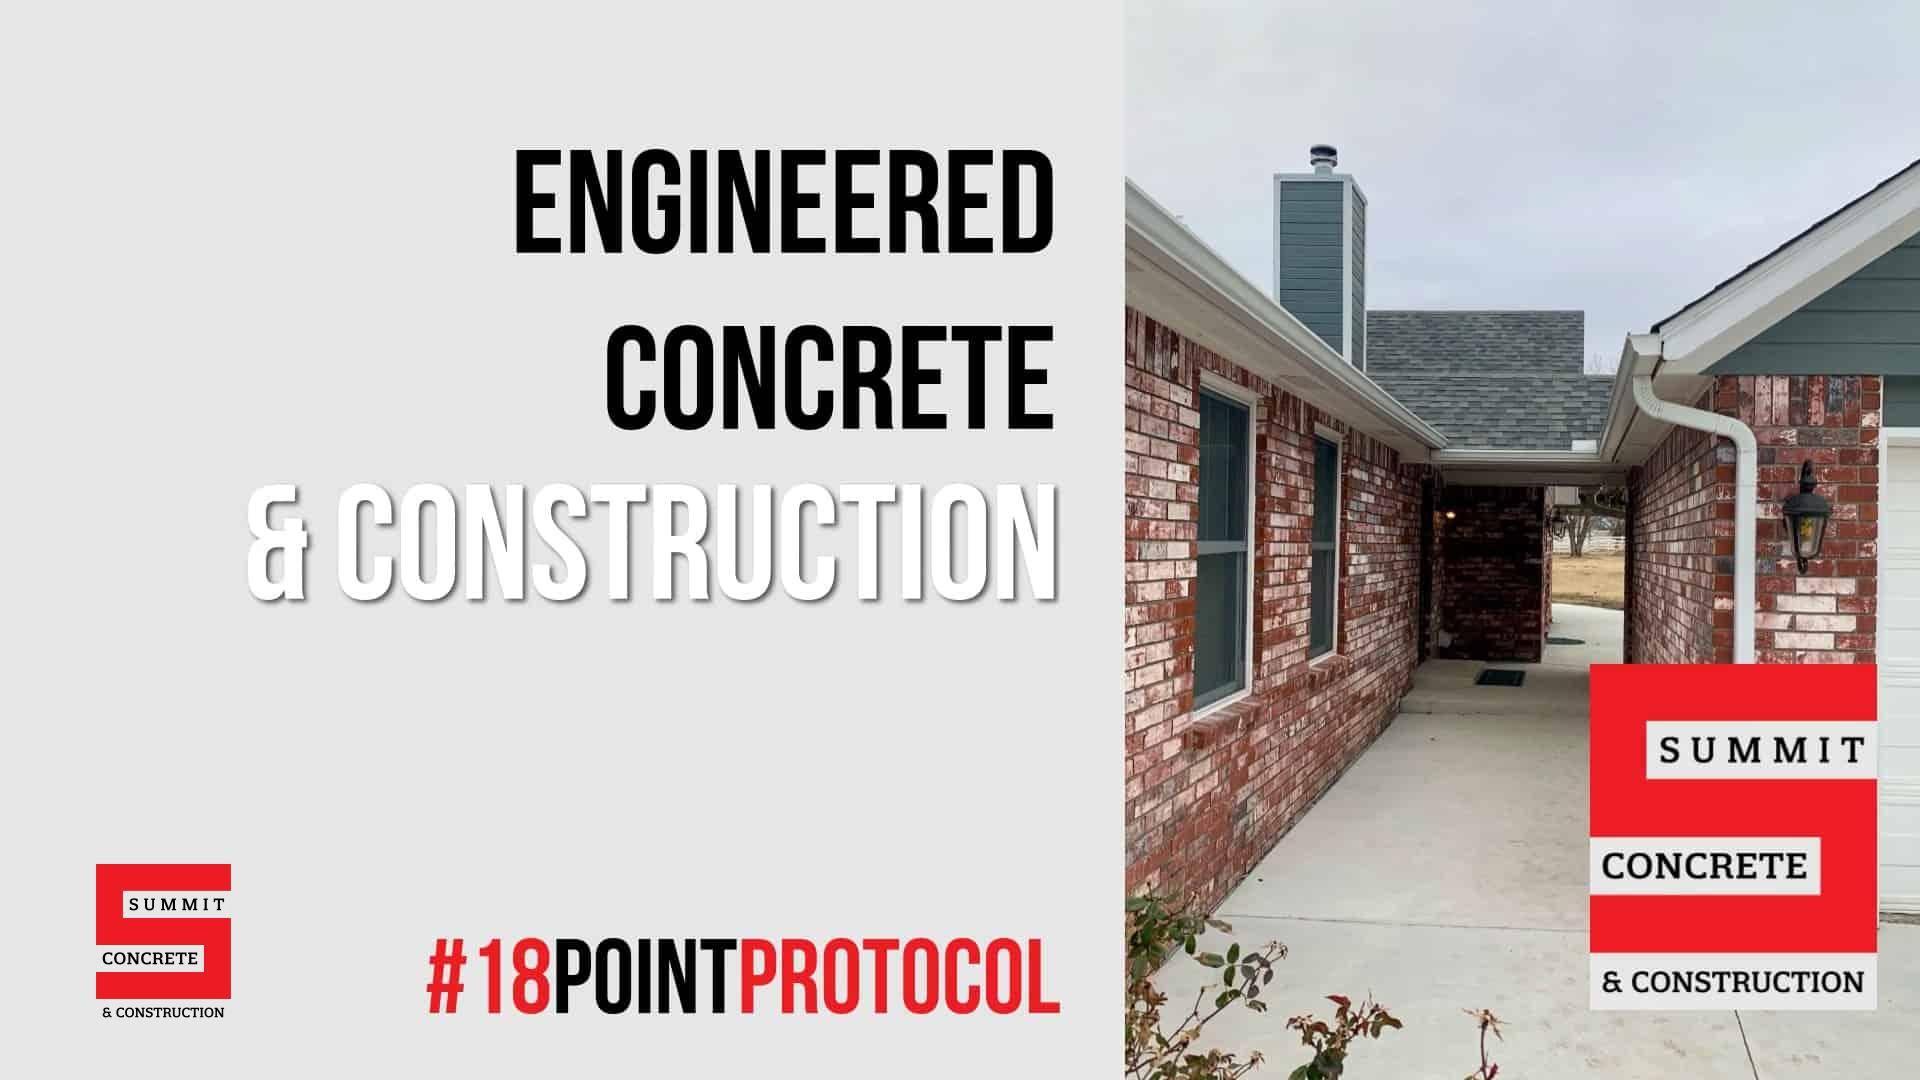 Oklahoma Concrete Project Progress Highlights from January 2021